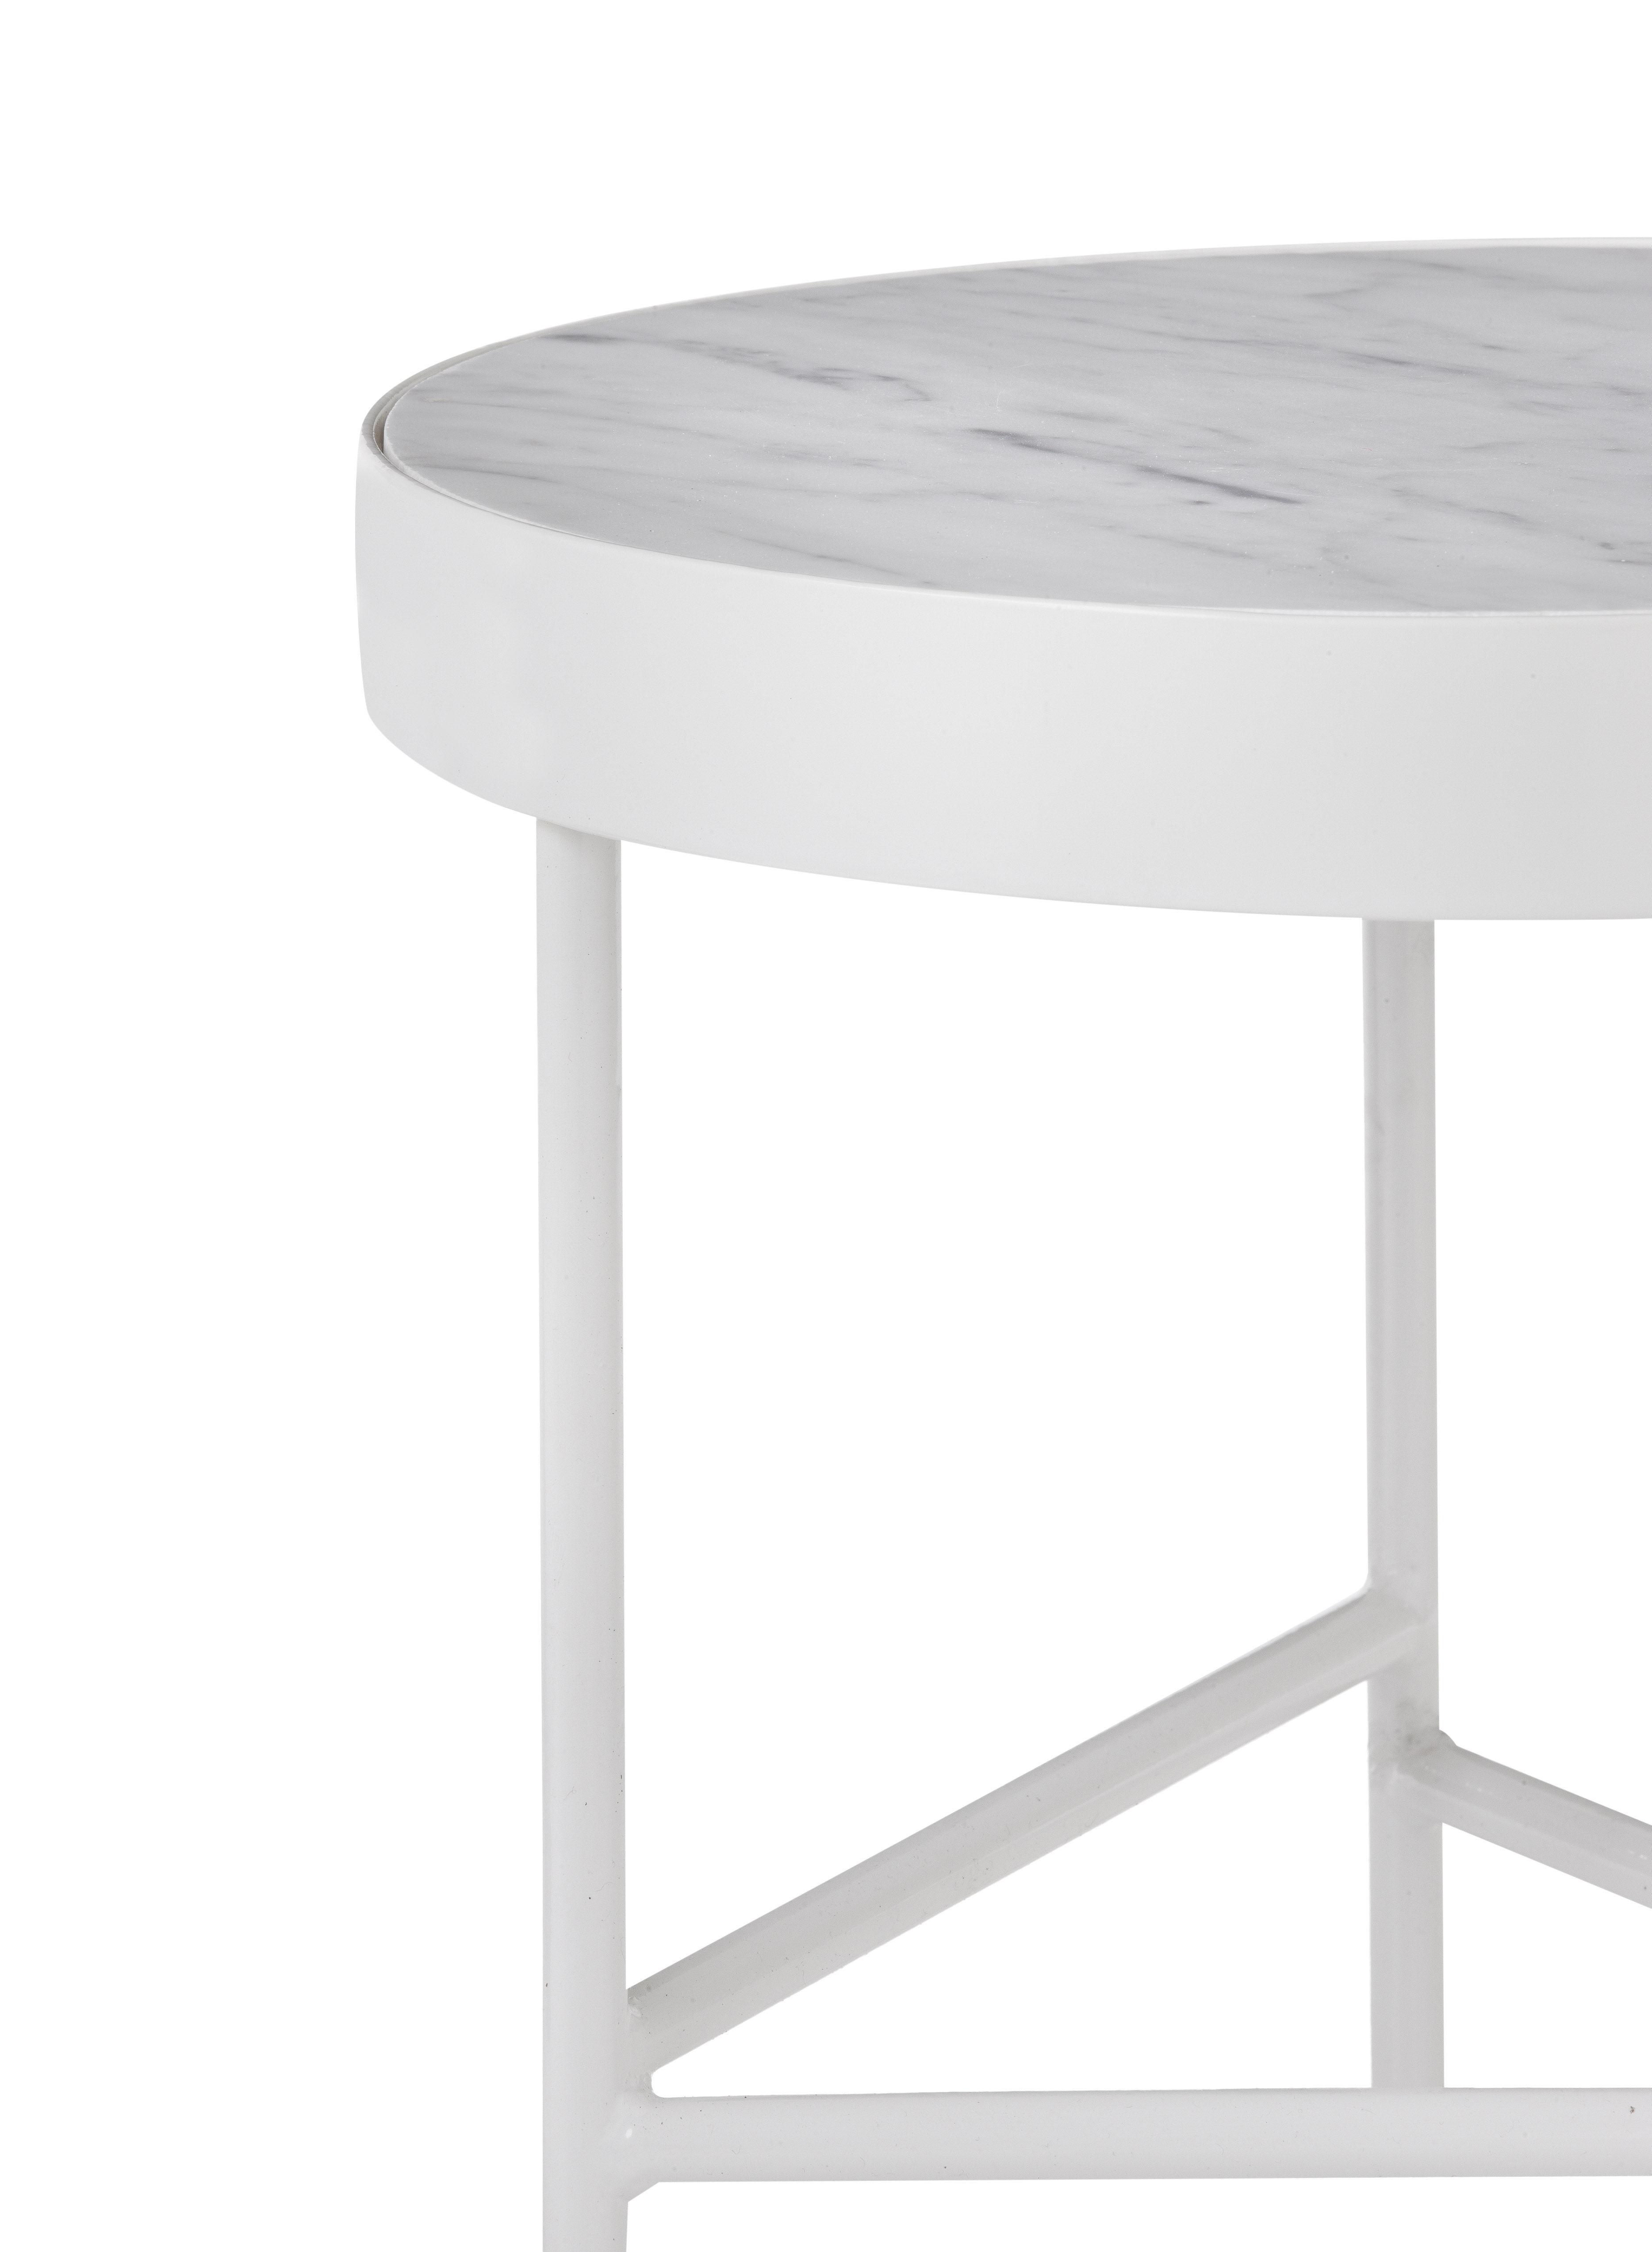 table d 39 appoint marble medium 40 x h 45 cm marbre blanc ferm living made in design. Black Bedroom Furniture Sets. Home Design Ideas